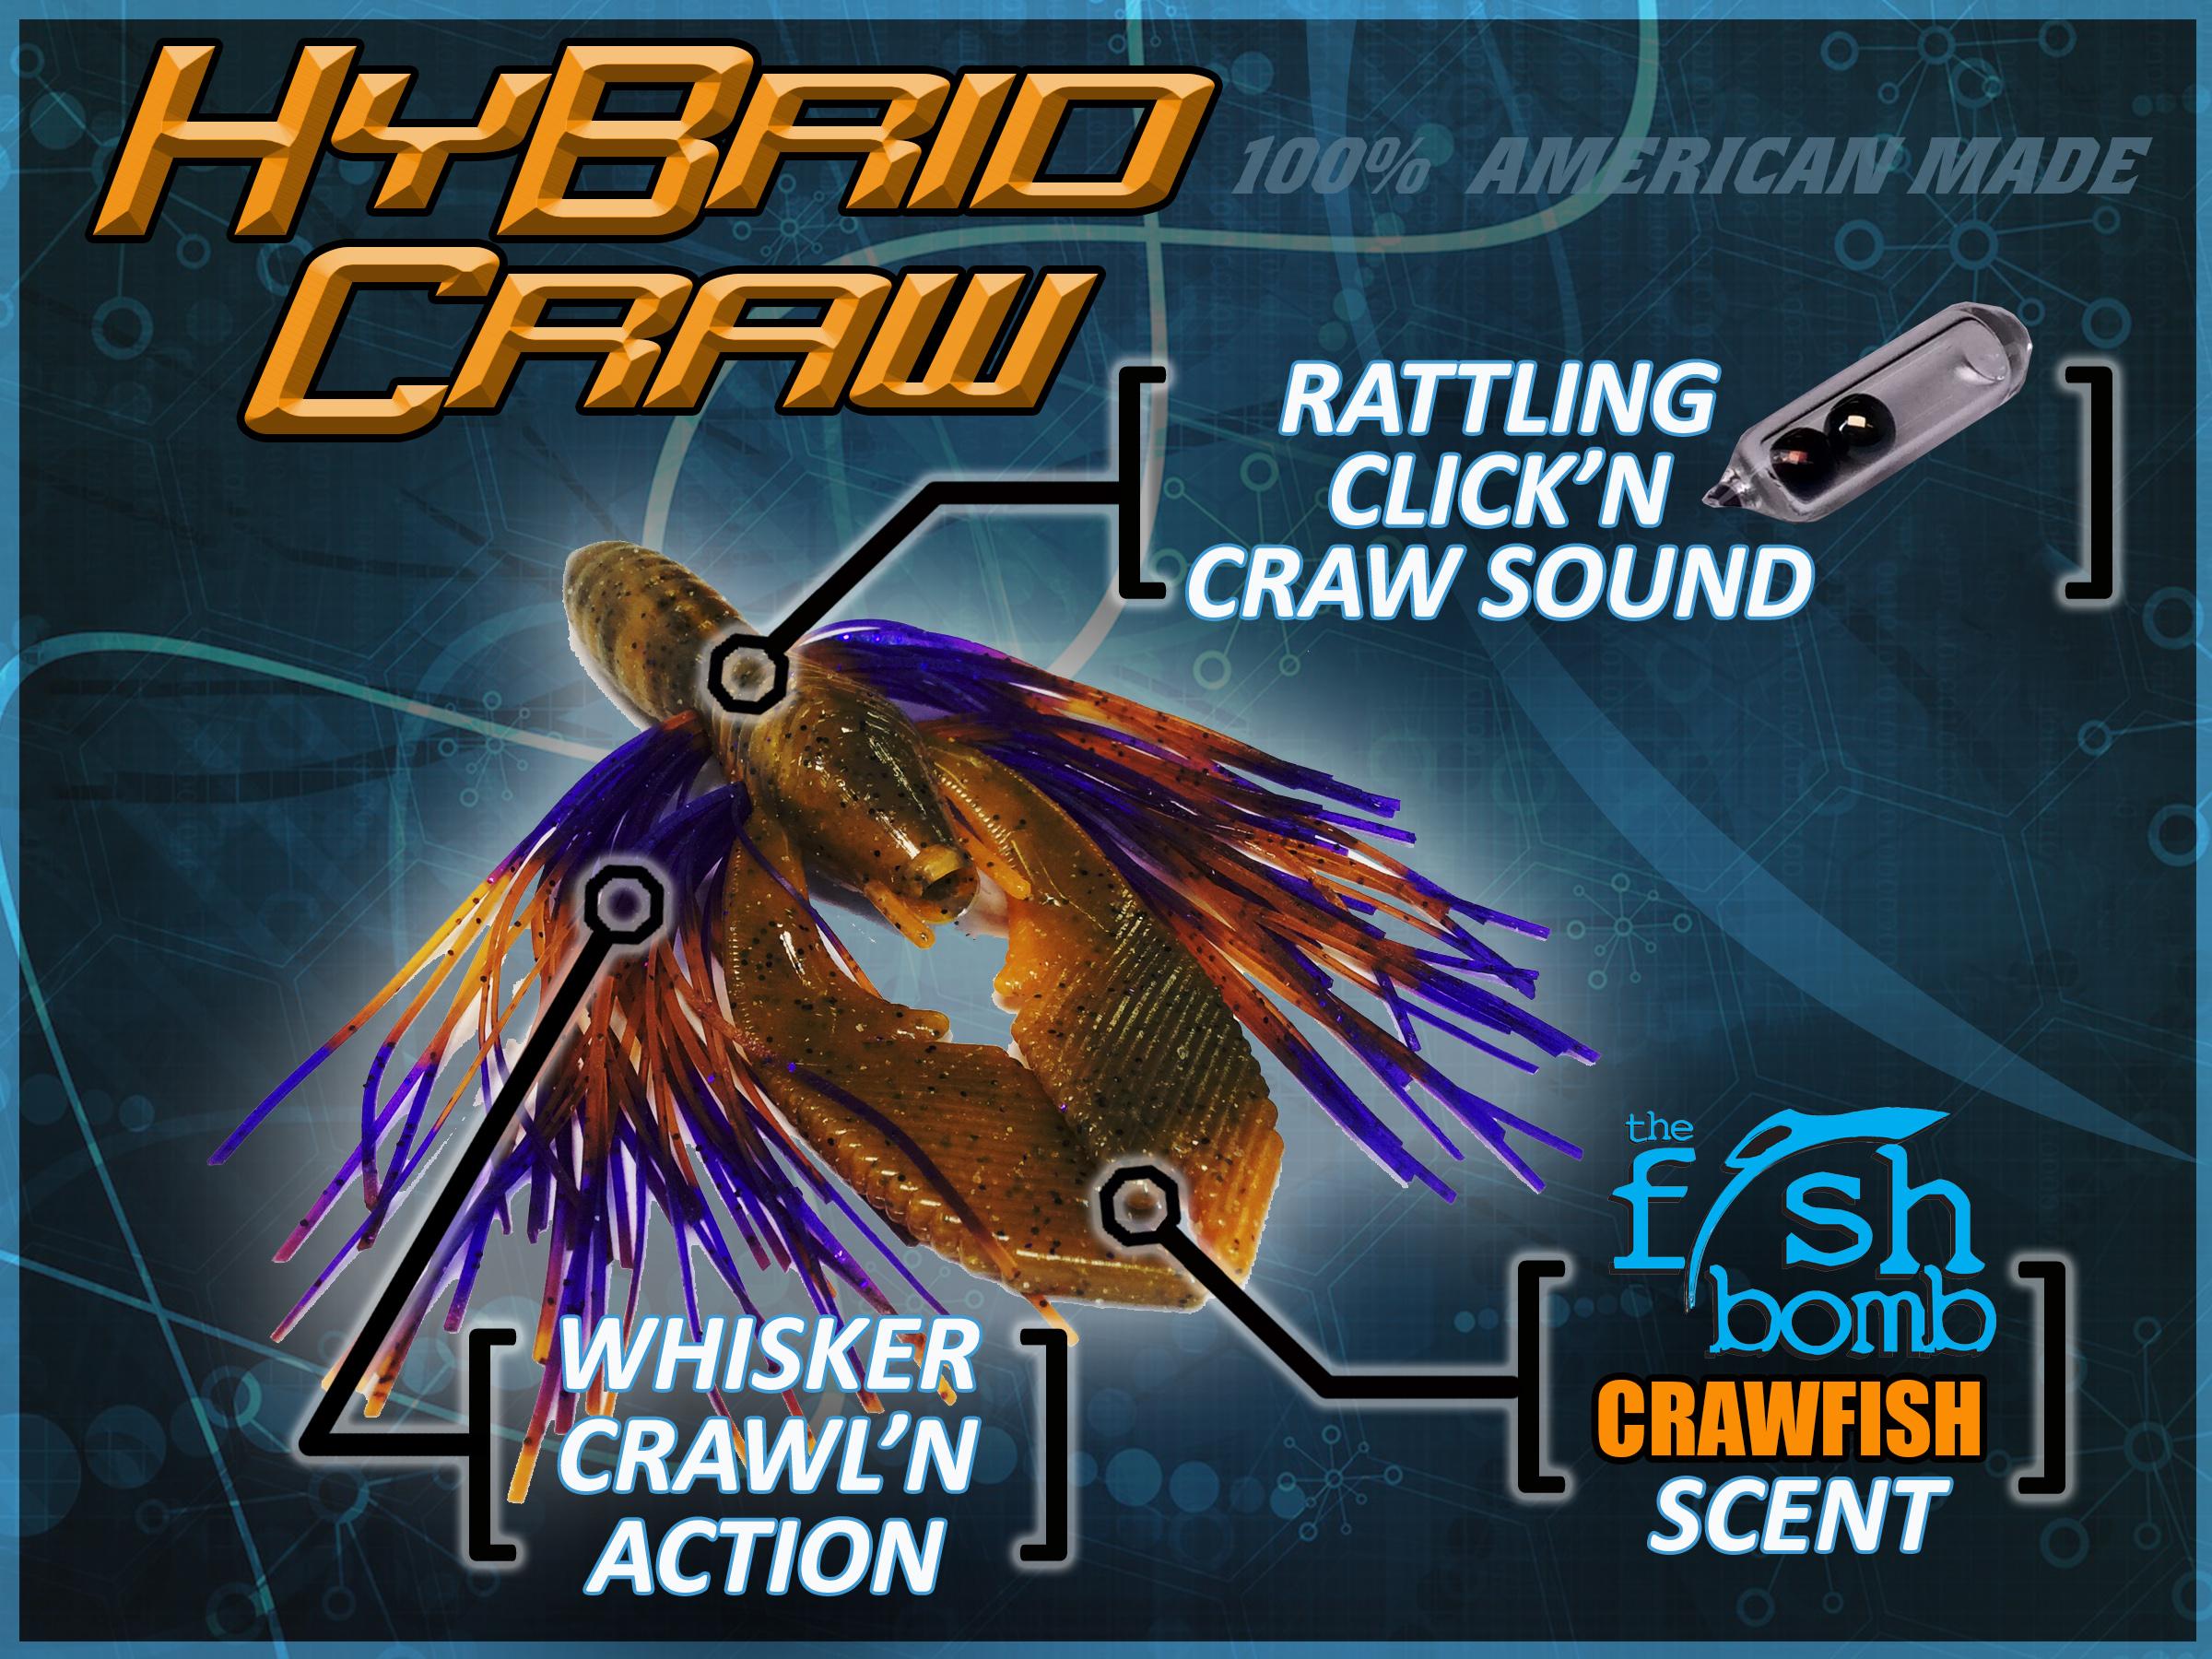 Hy-Brid Craw Rattling